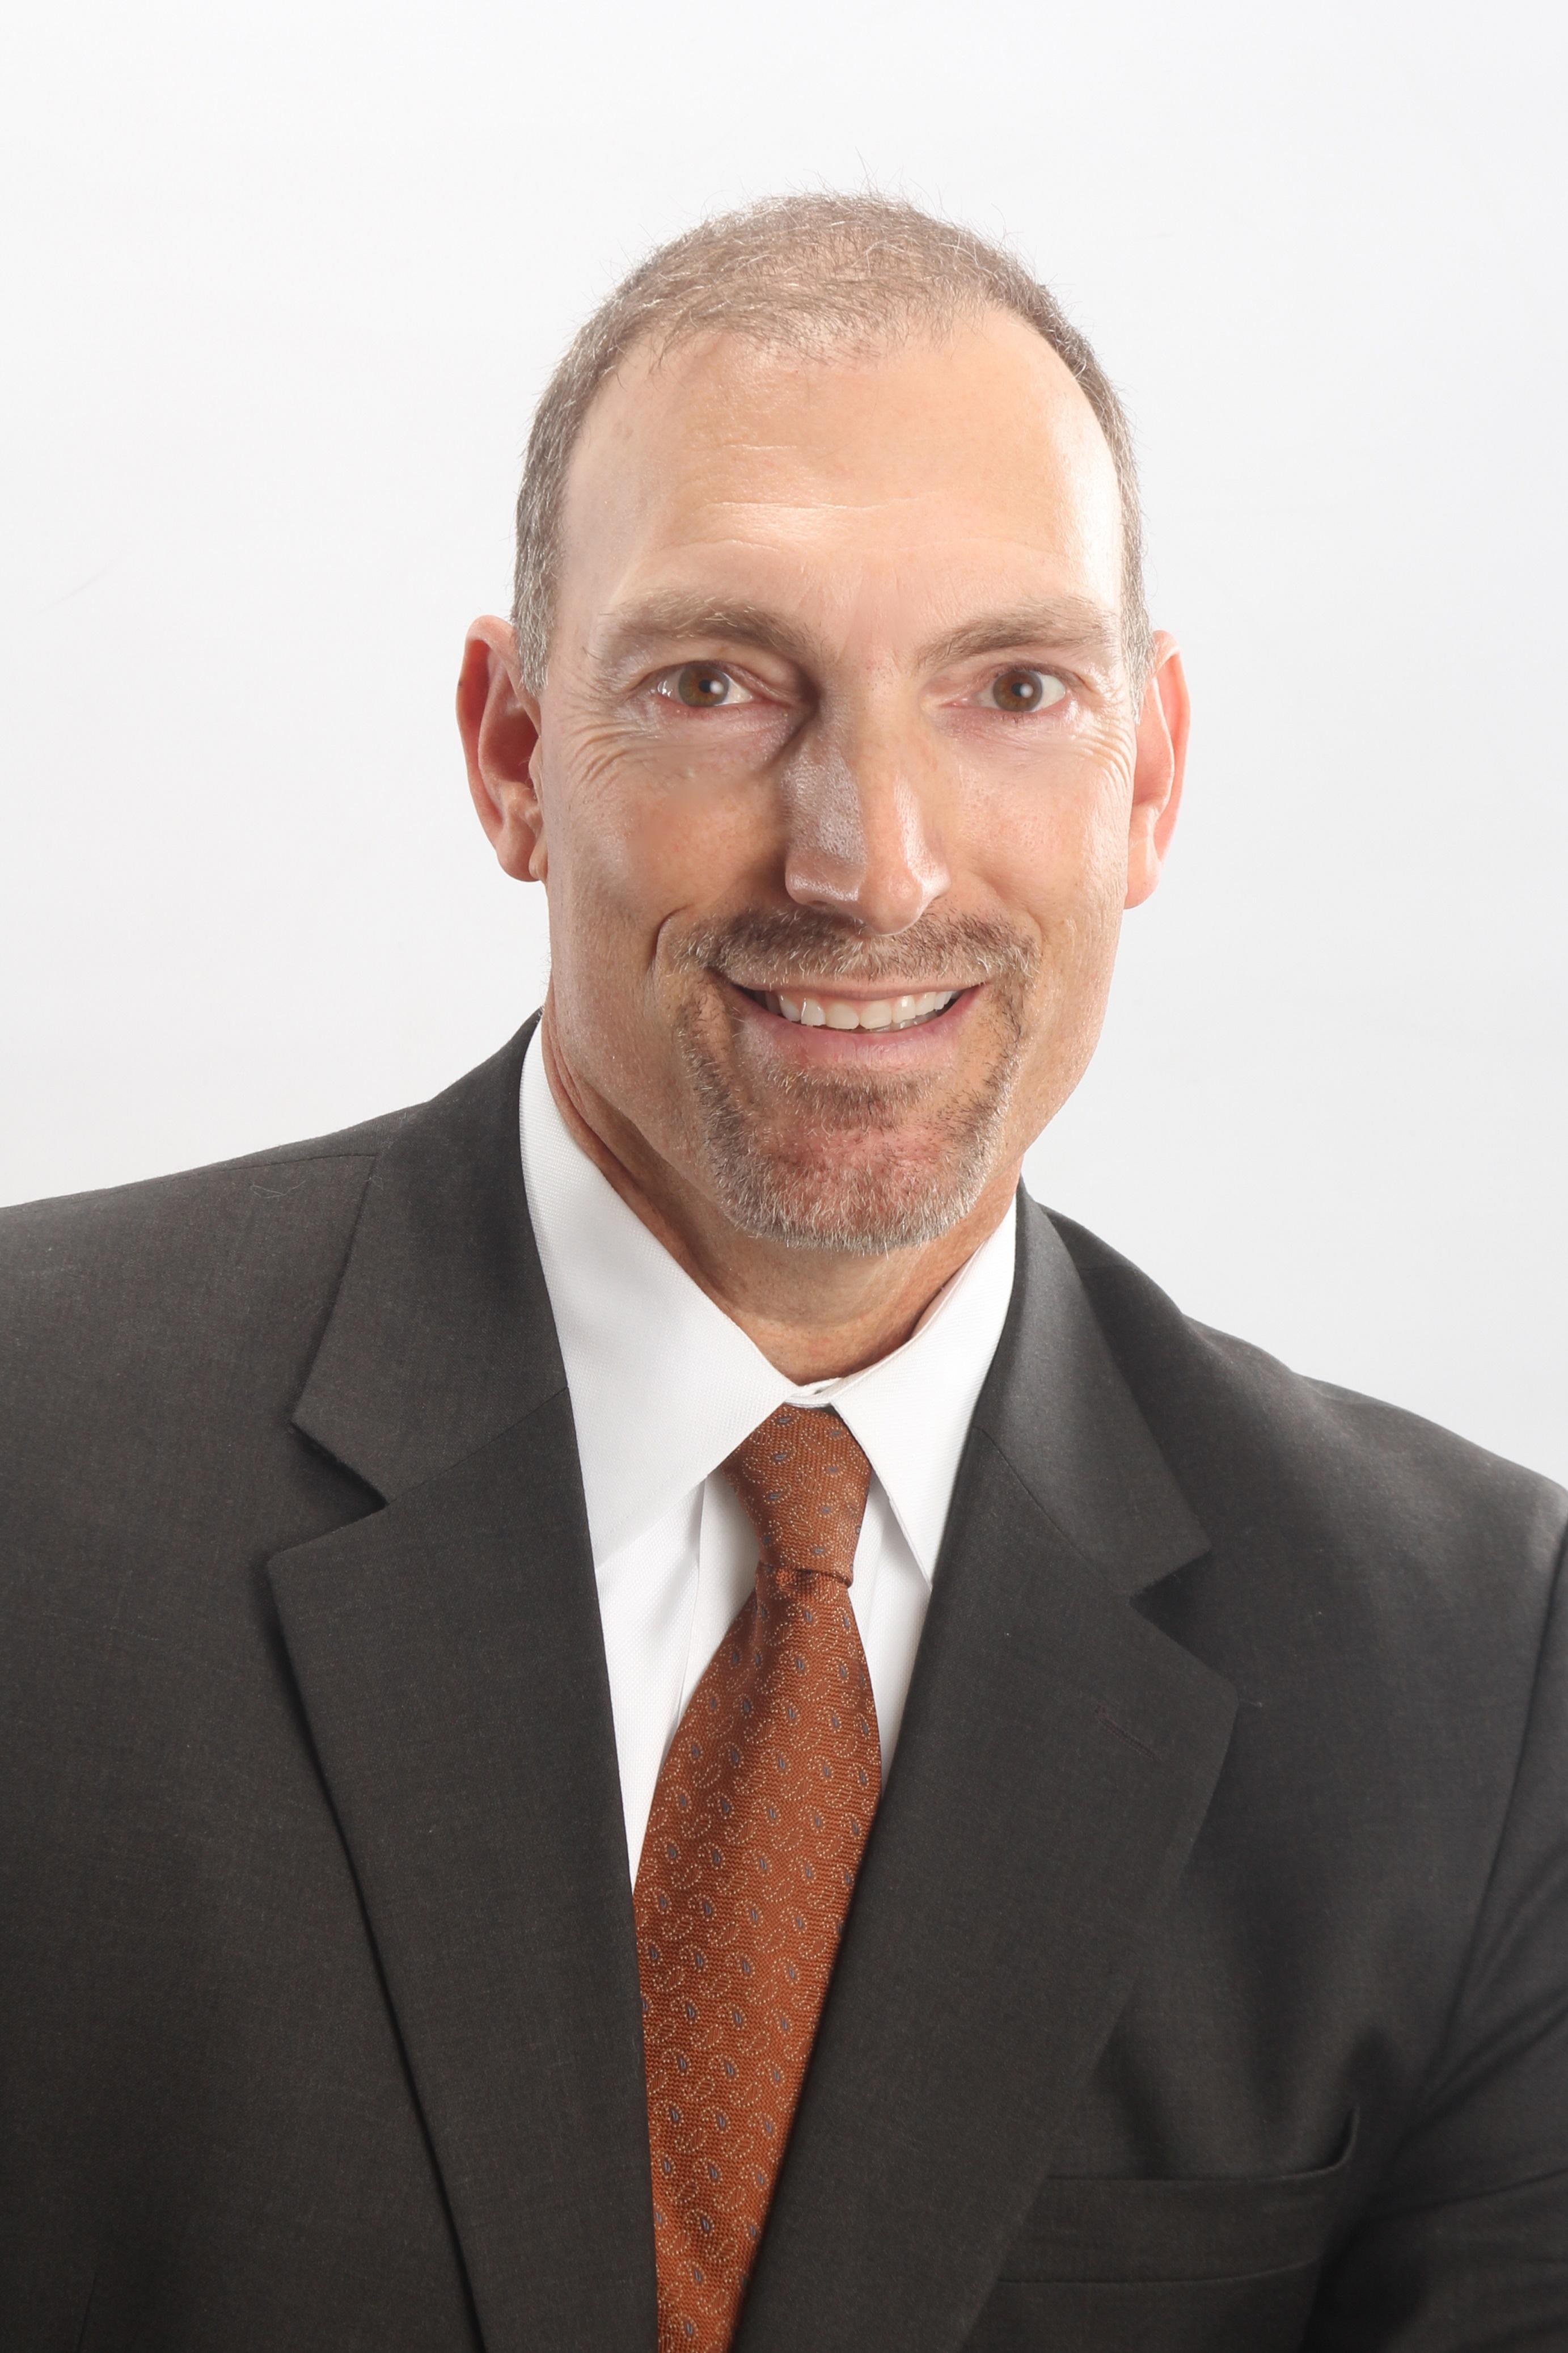 William Porterfield, financial advisor Hurst TX